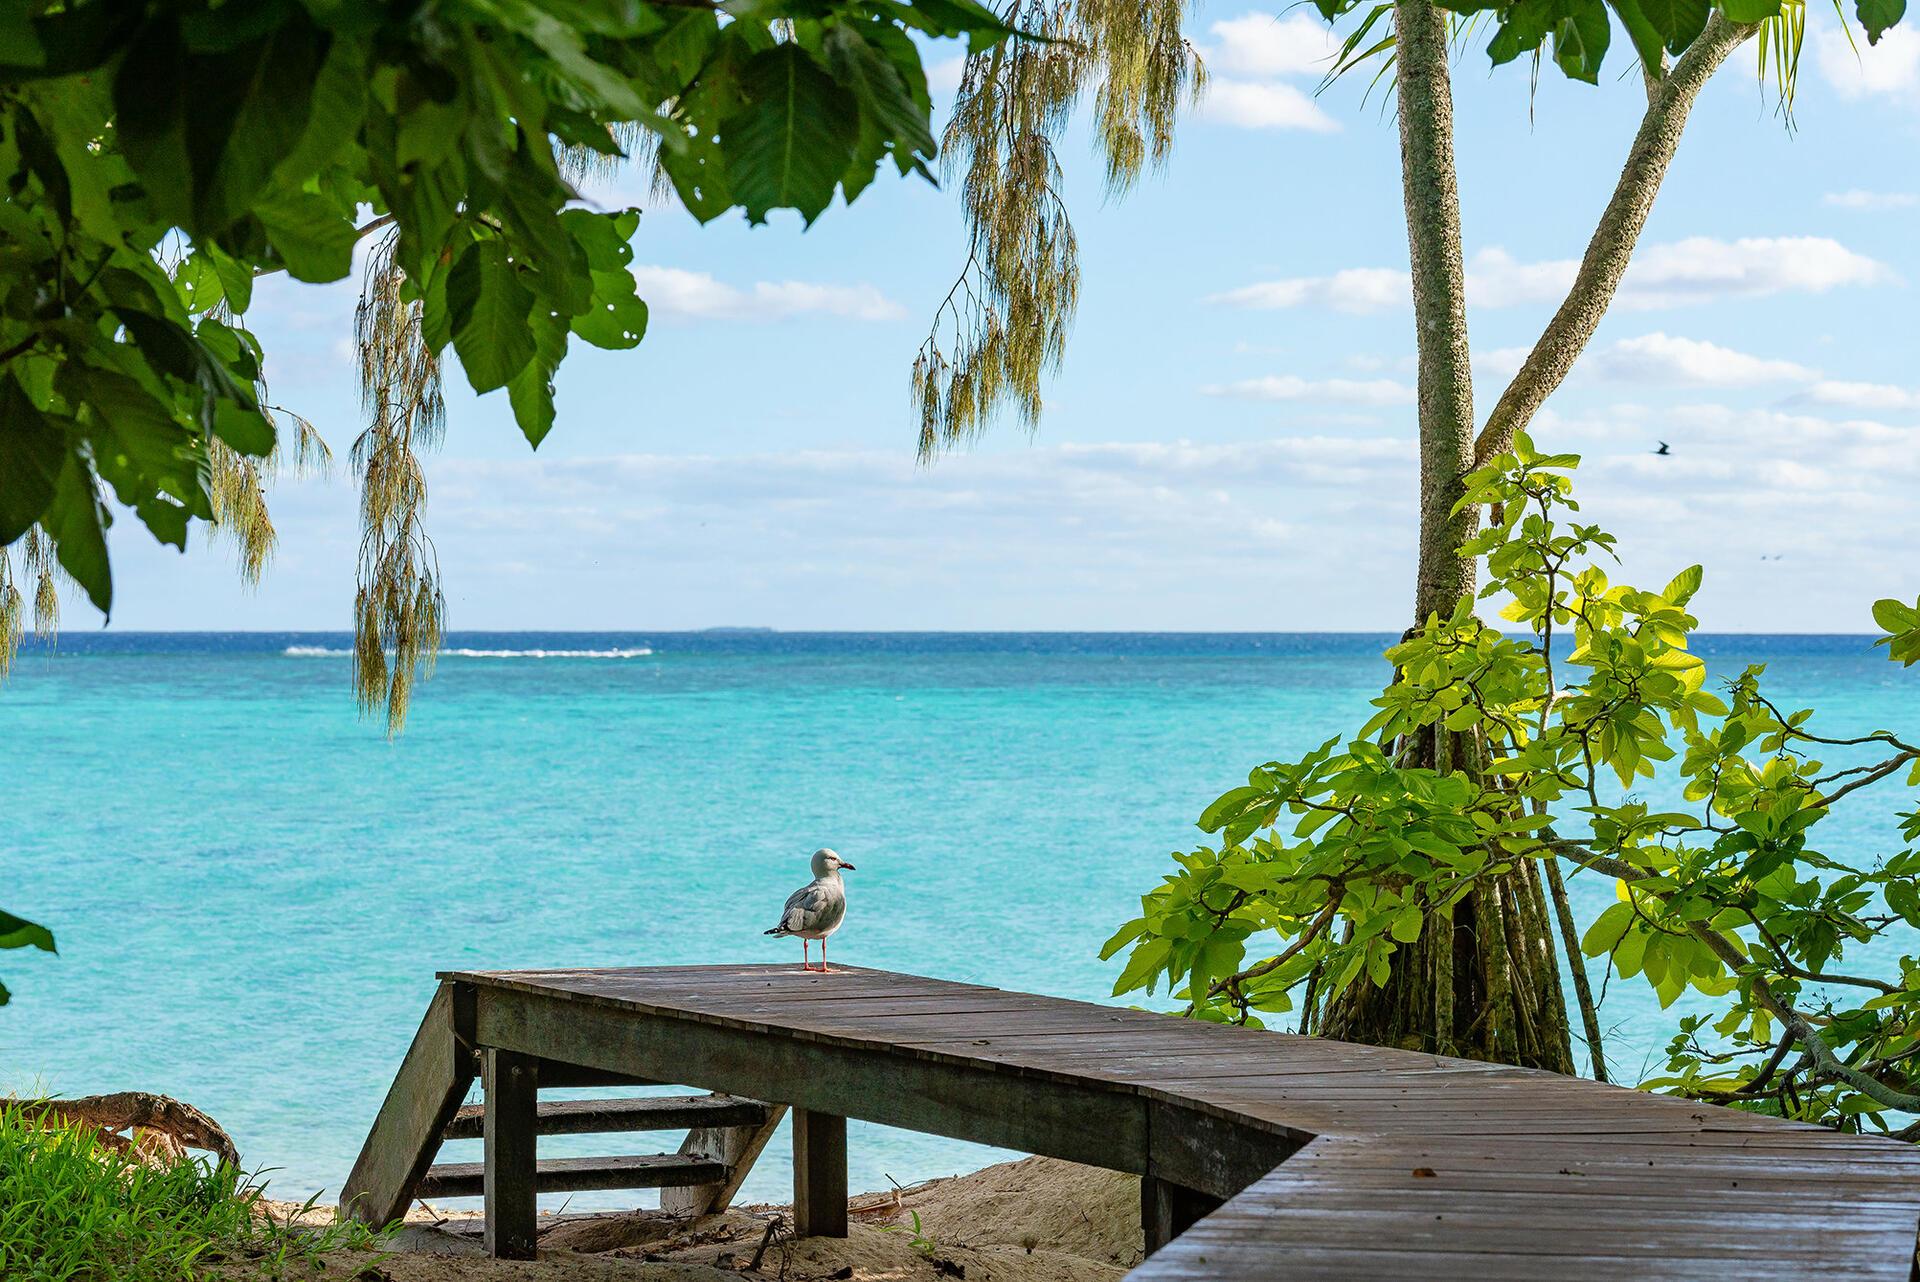 Beach near Heron Island Resort in Queensland, Australia